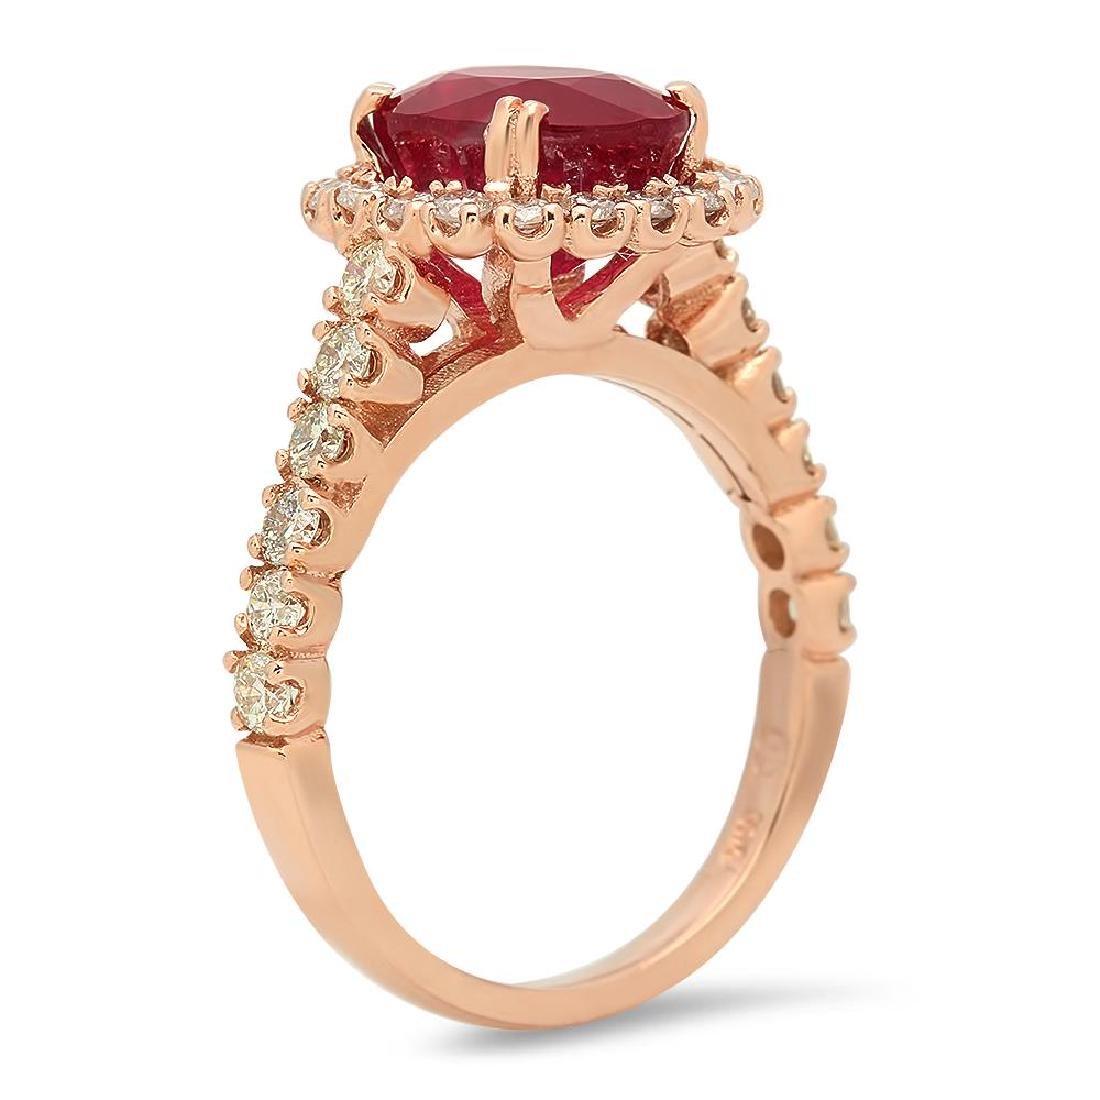 14K Gold 4.43ct Ruby 1.05cts Diamond Ring